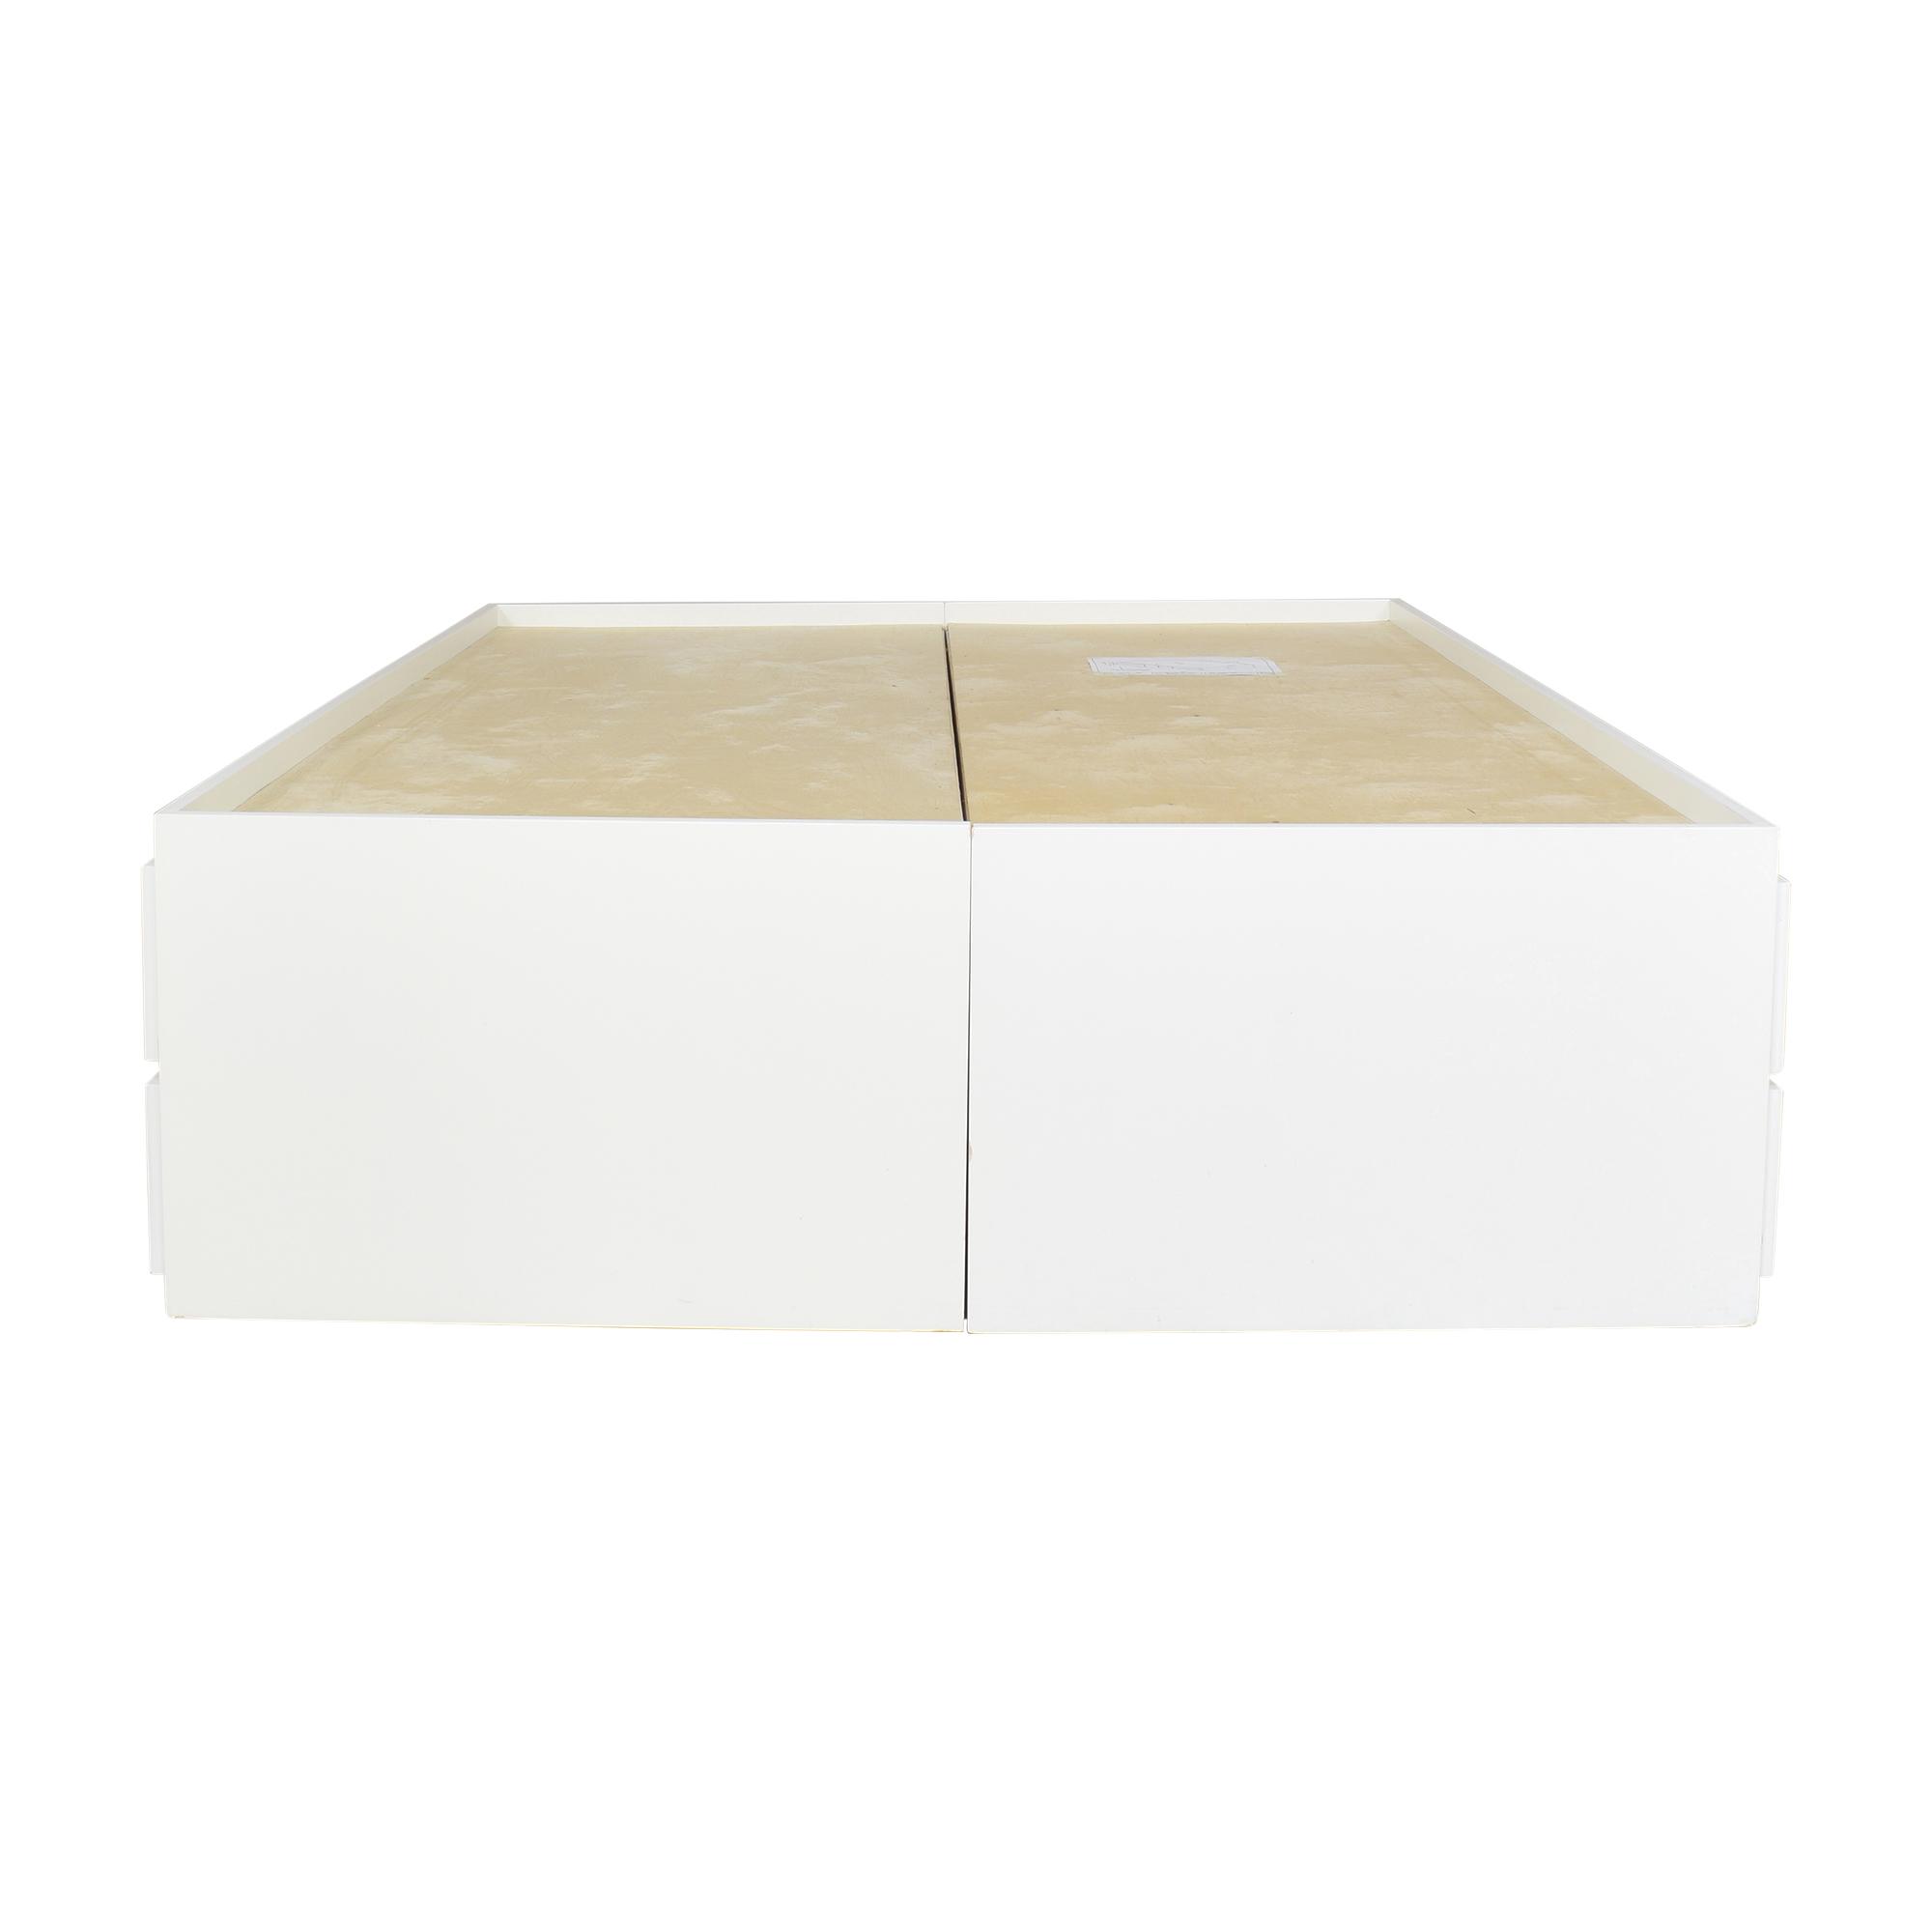 Gothic Cabinet Craft Gothic Cabinet Craft Custom Storage Queen Bed nyc